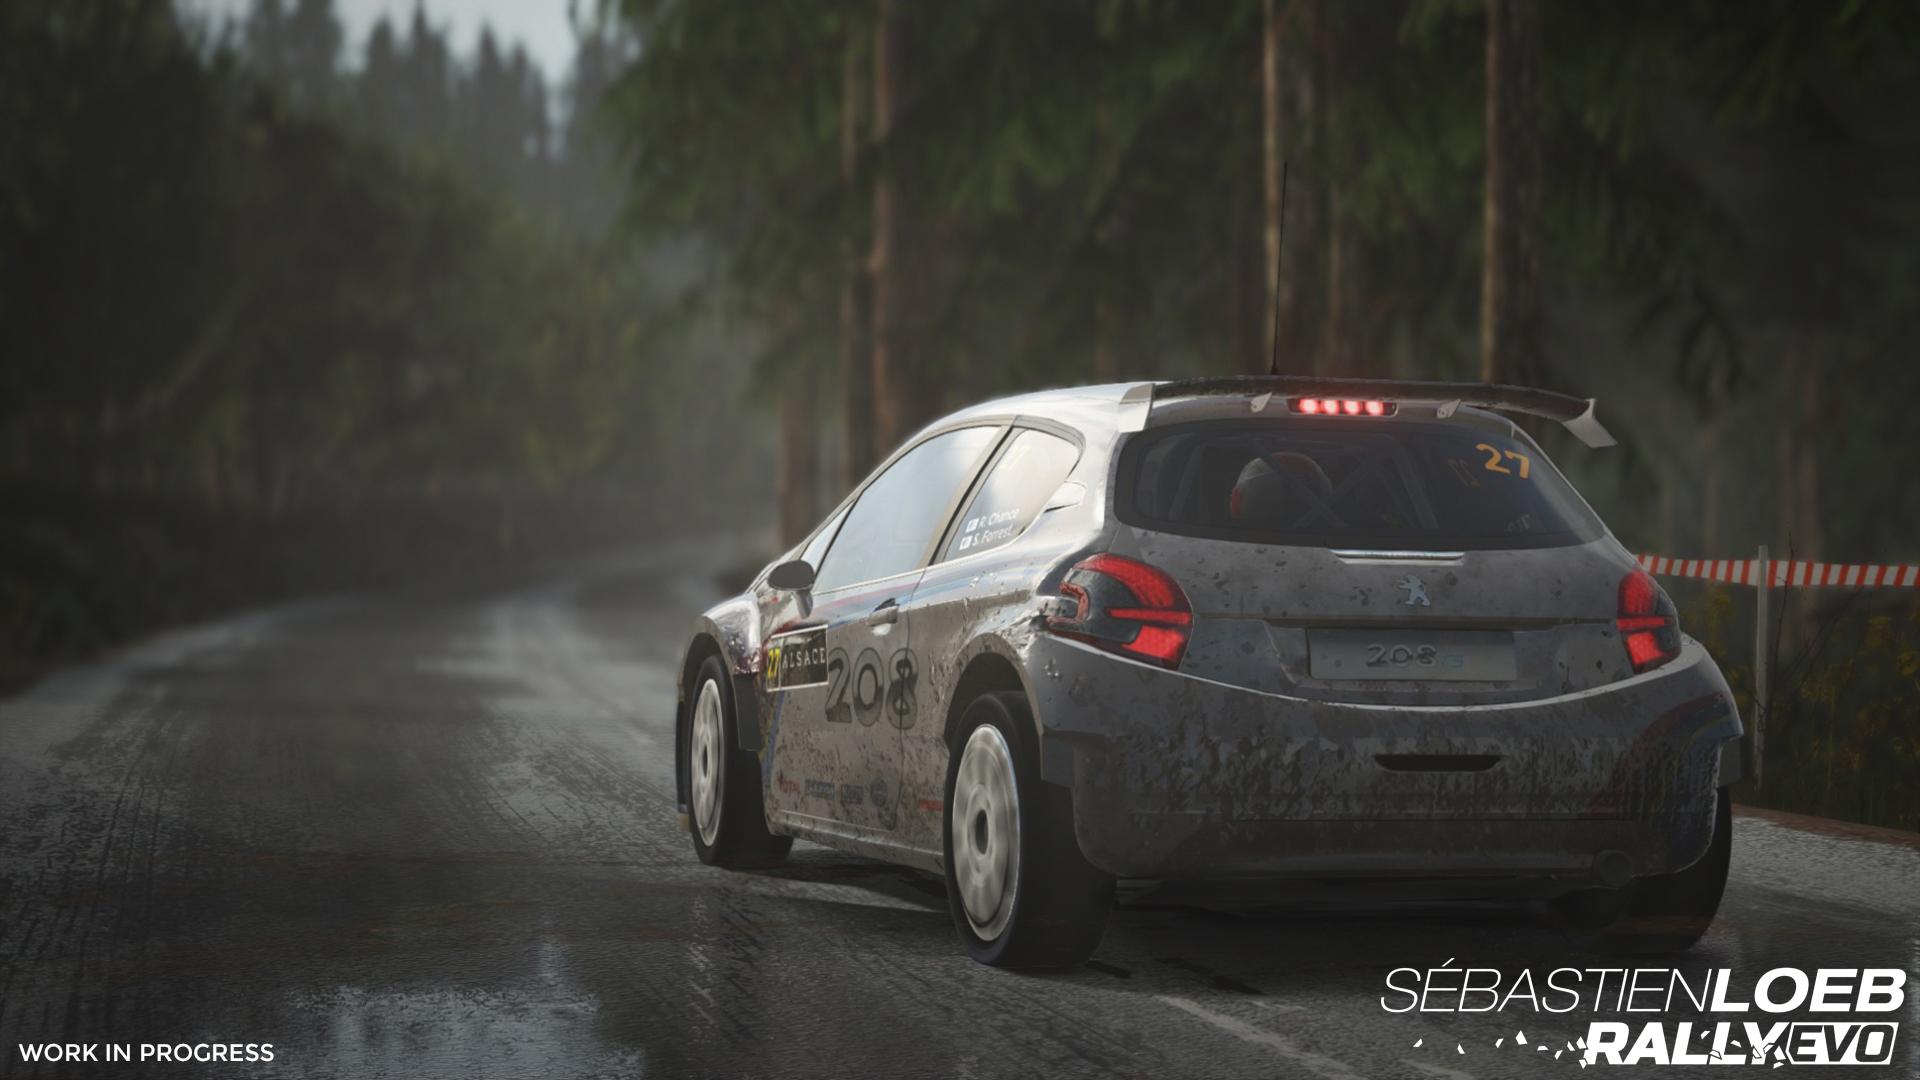 Sebastien Loeb Rally EVO (ENG) [L]